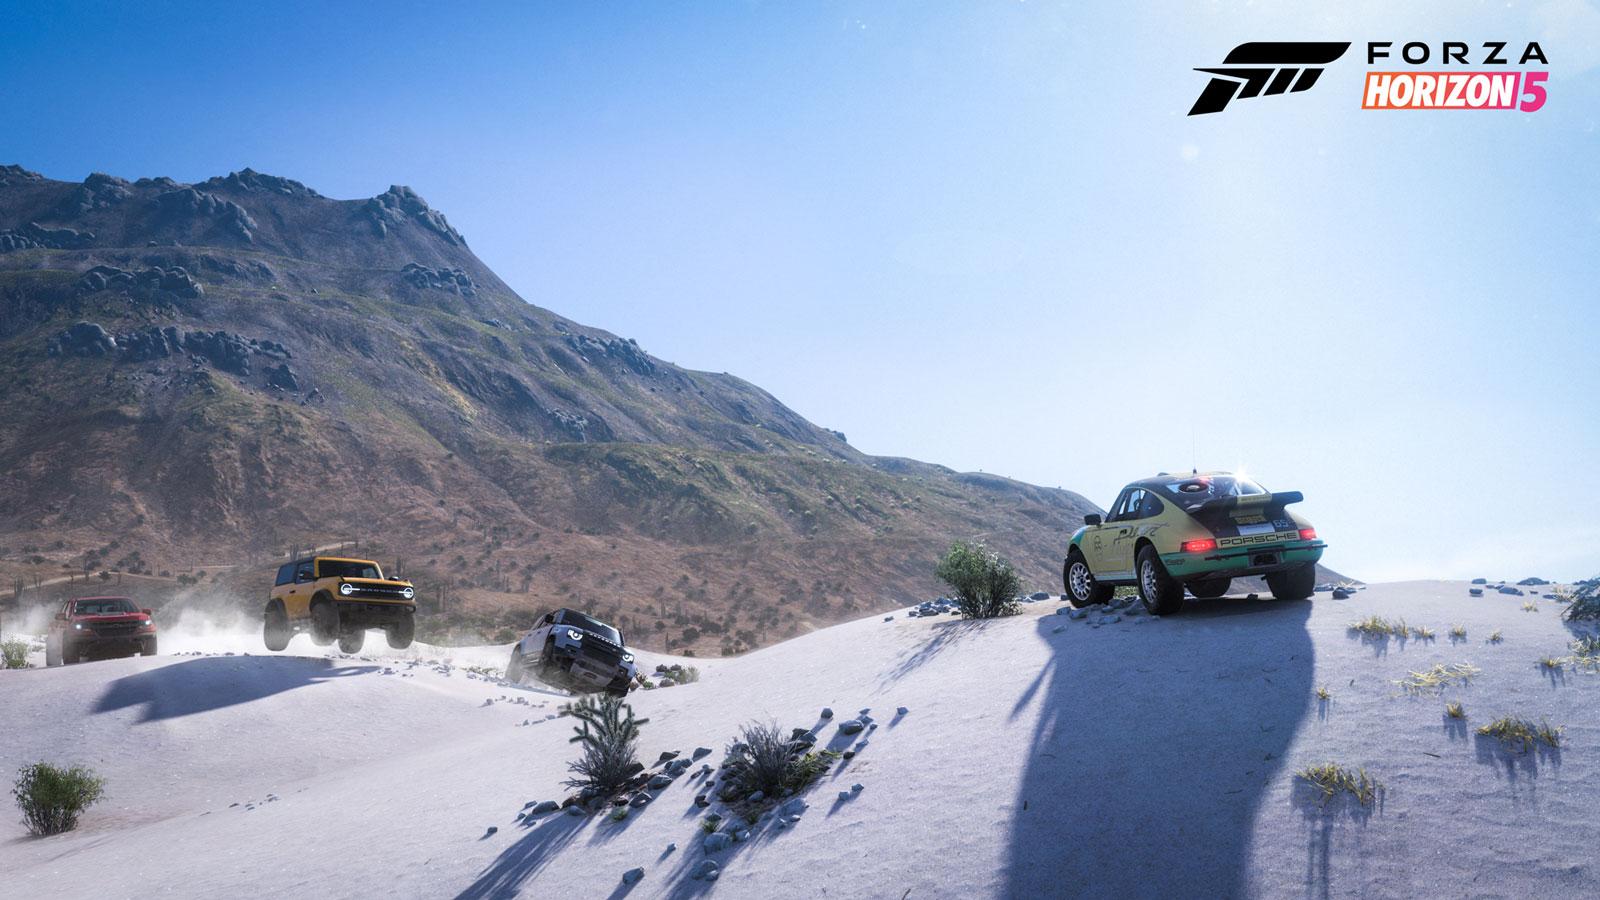 Free Forza Horizon 5 Wallpaper in 1600x900